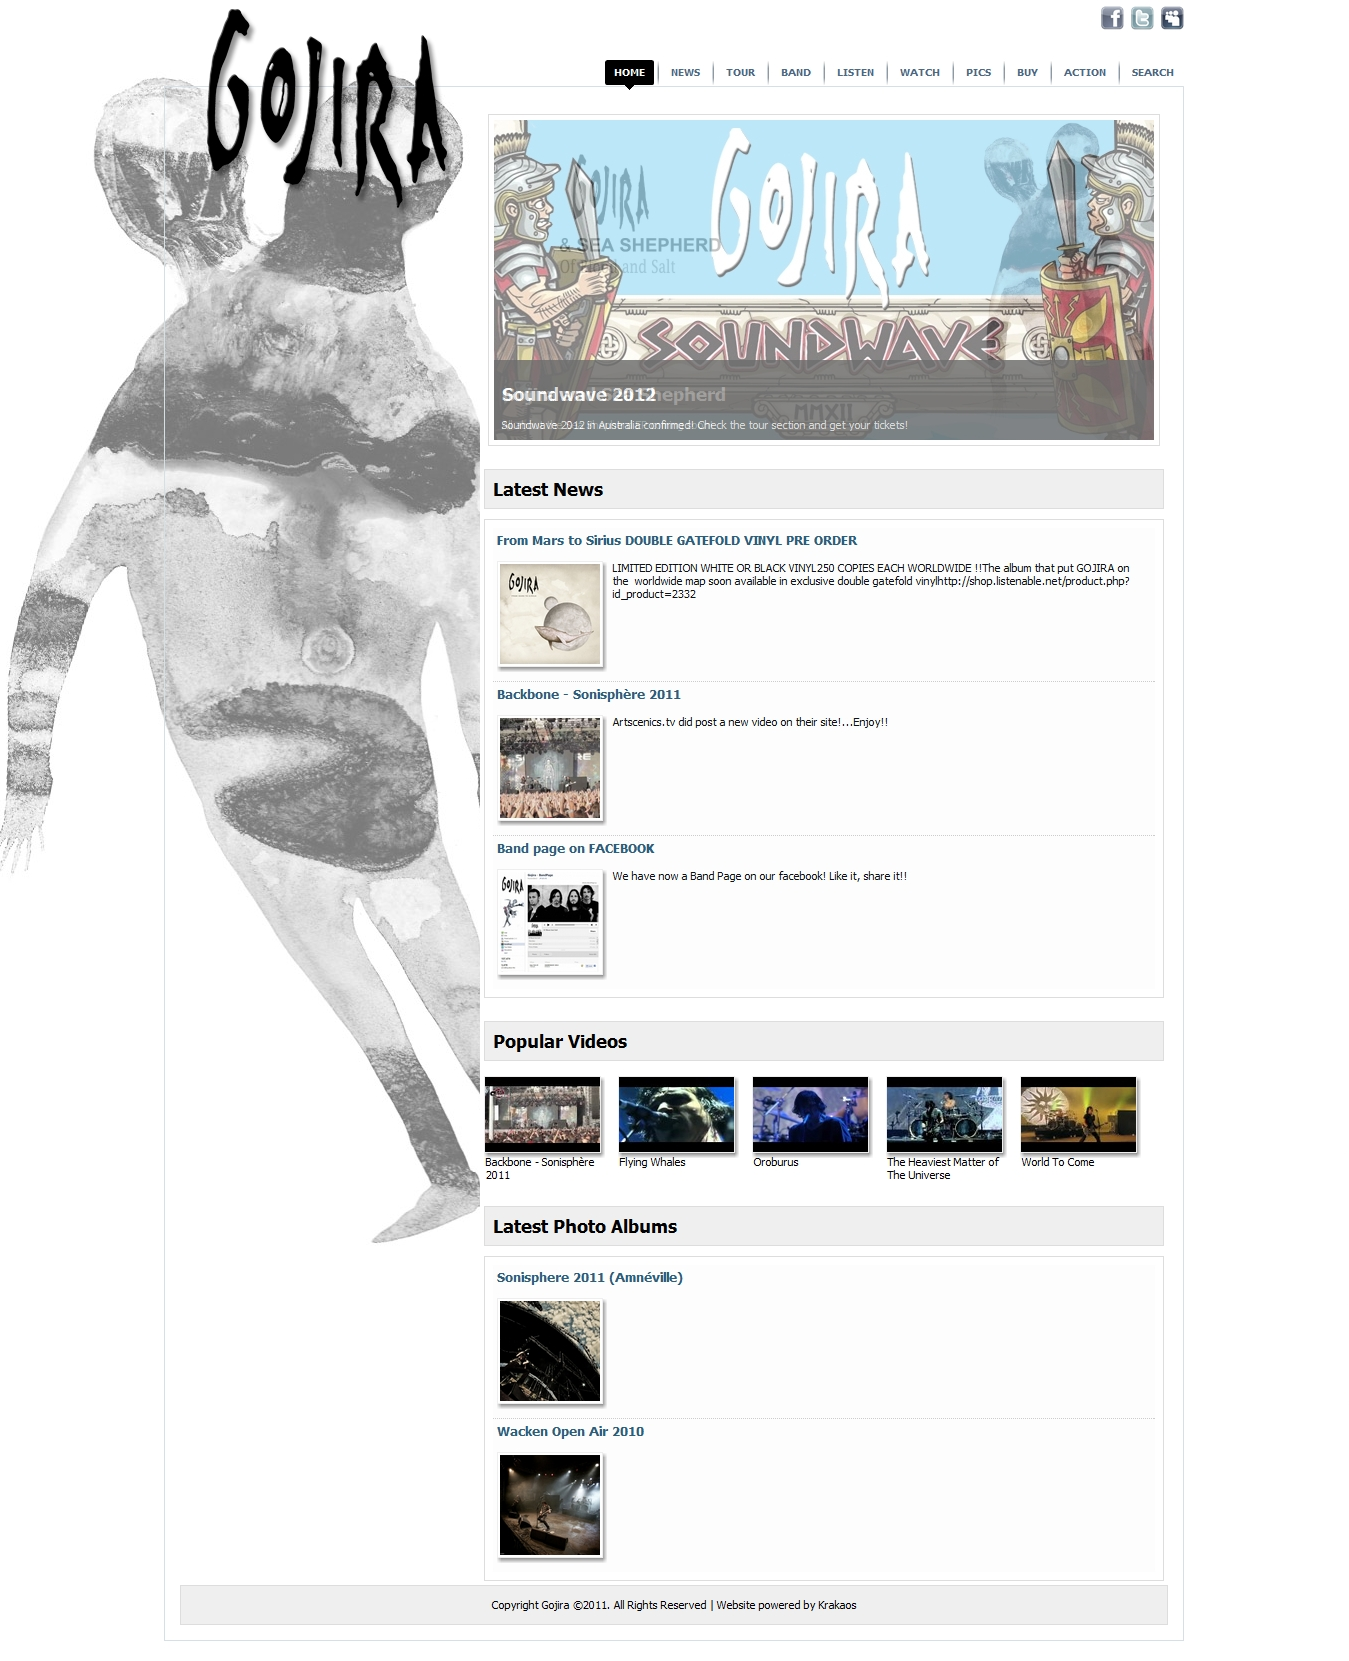 gojira from mars to sirius cover - photo #26